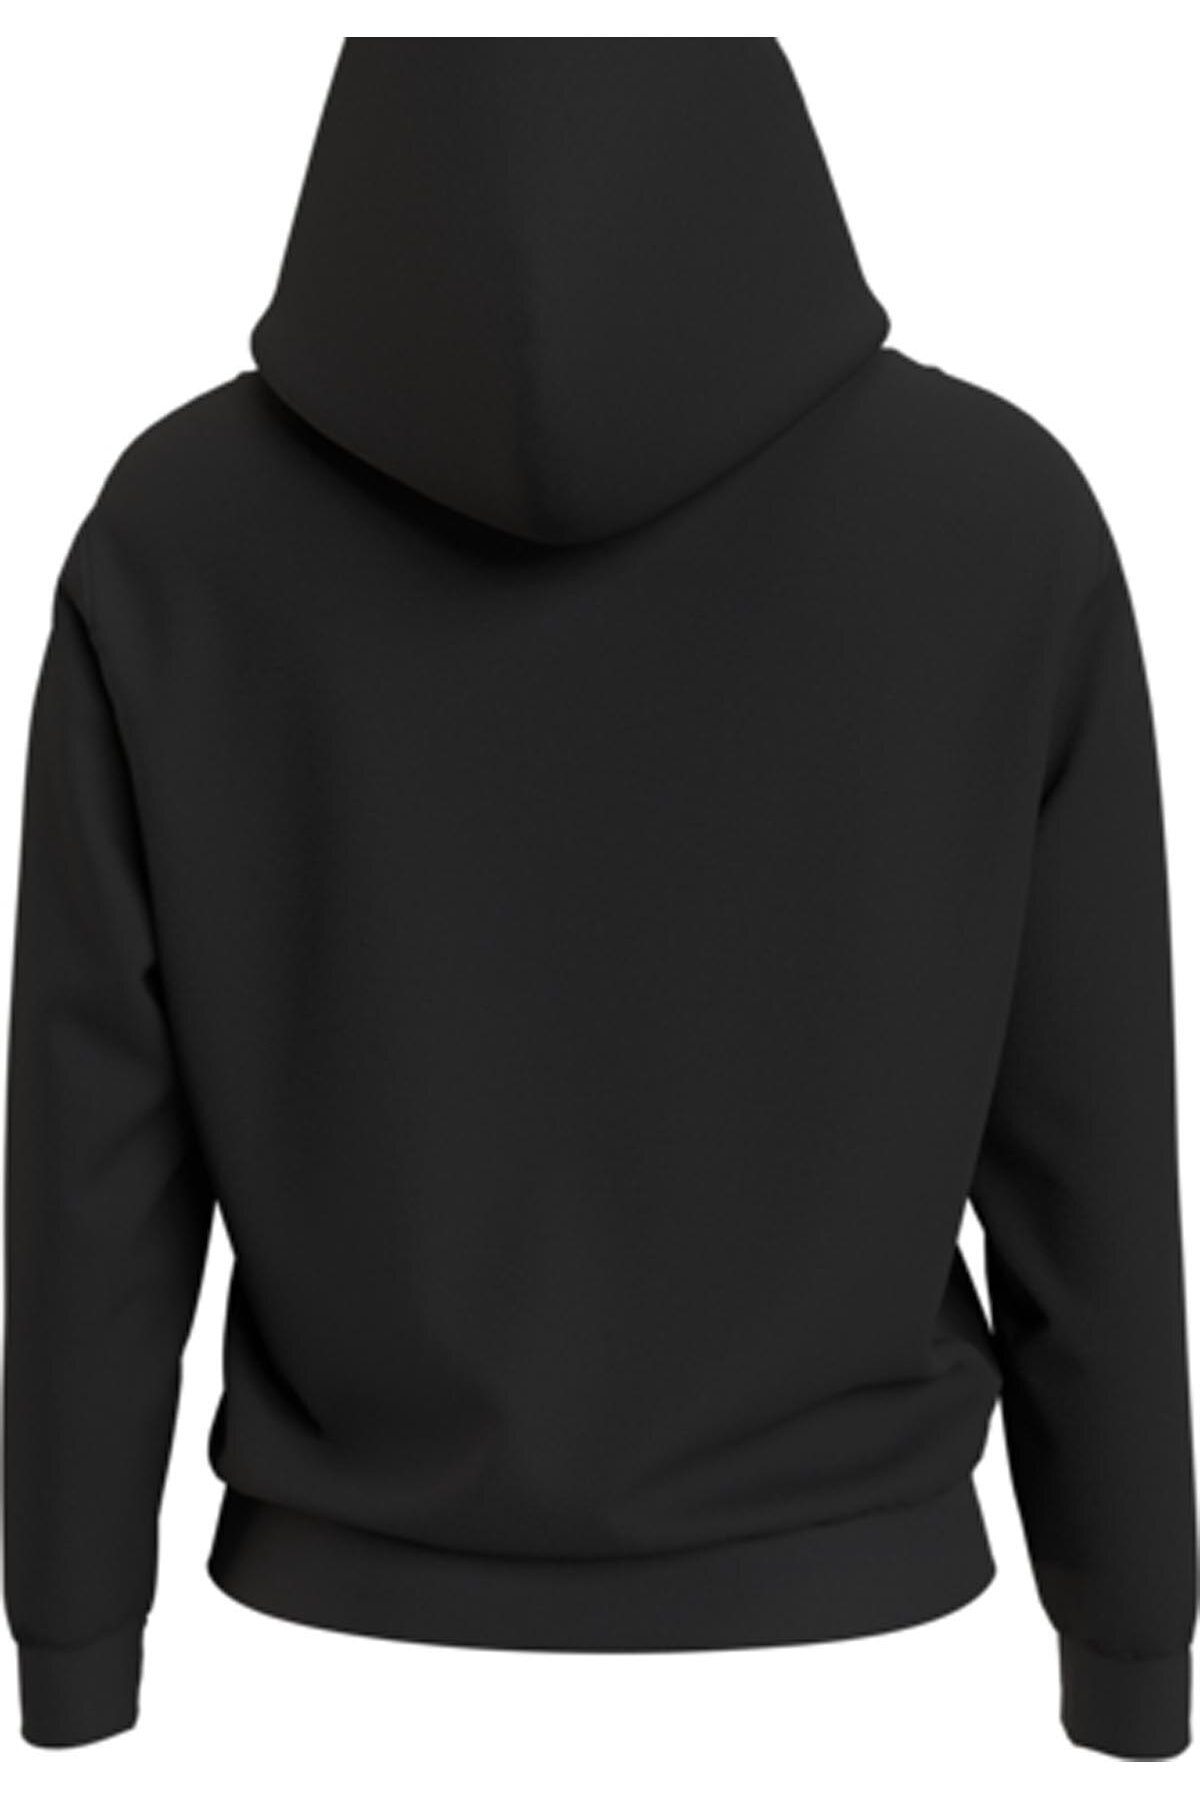 Tommy Hilfiger Kadın Siyah Sweatshirt Tjw Lınear Logo Hoodıe DW0DW08972 2